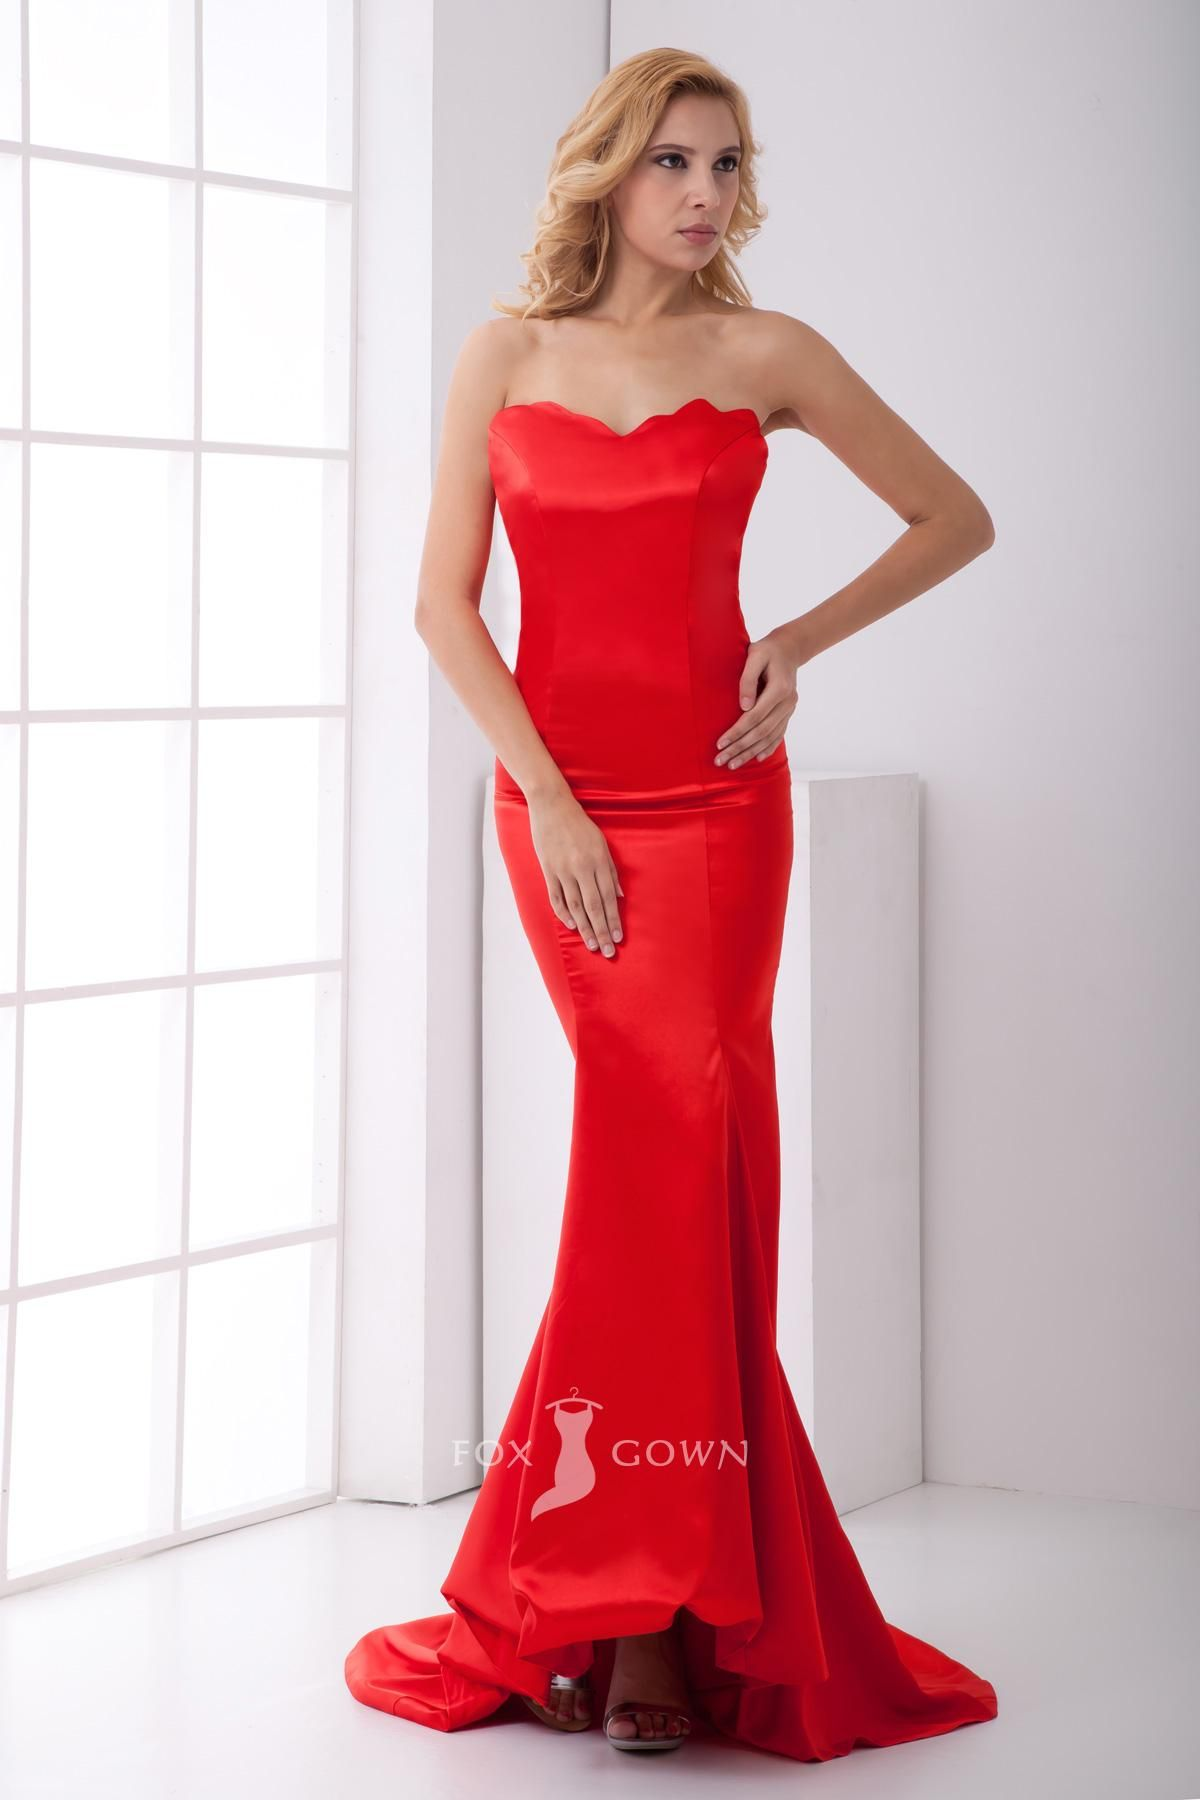 Name brand wedding dresses  fashion red mermaid slim strapless long jagged edges neckline